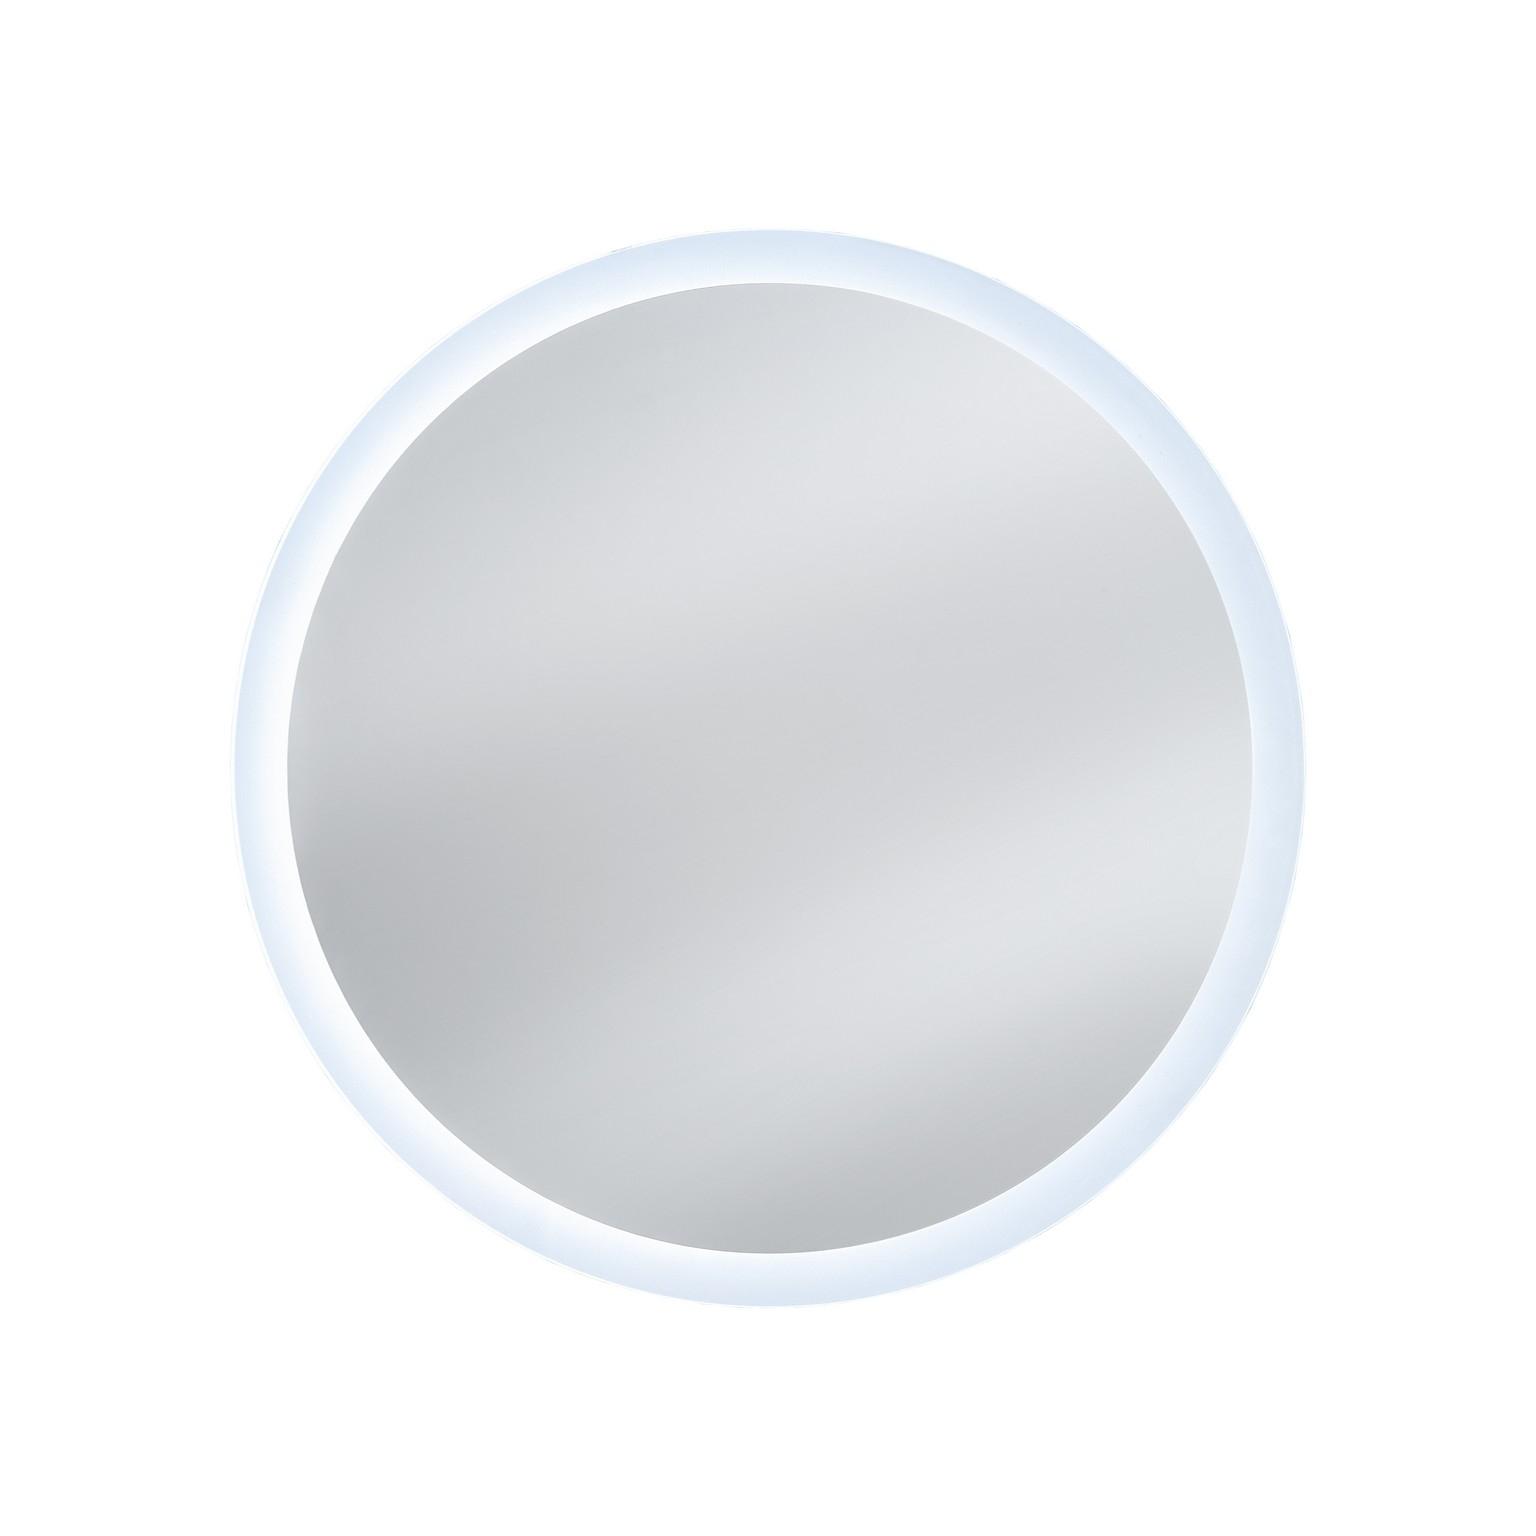 Oglinda pentru baie cu Led Venus Ø 80 cm imagine